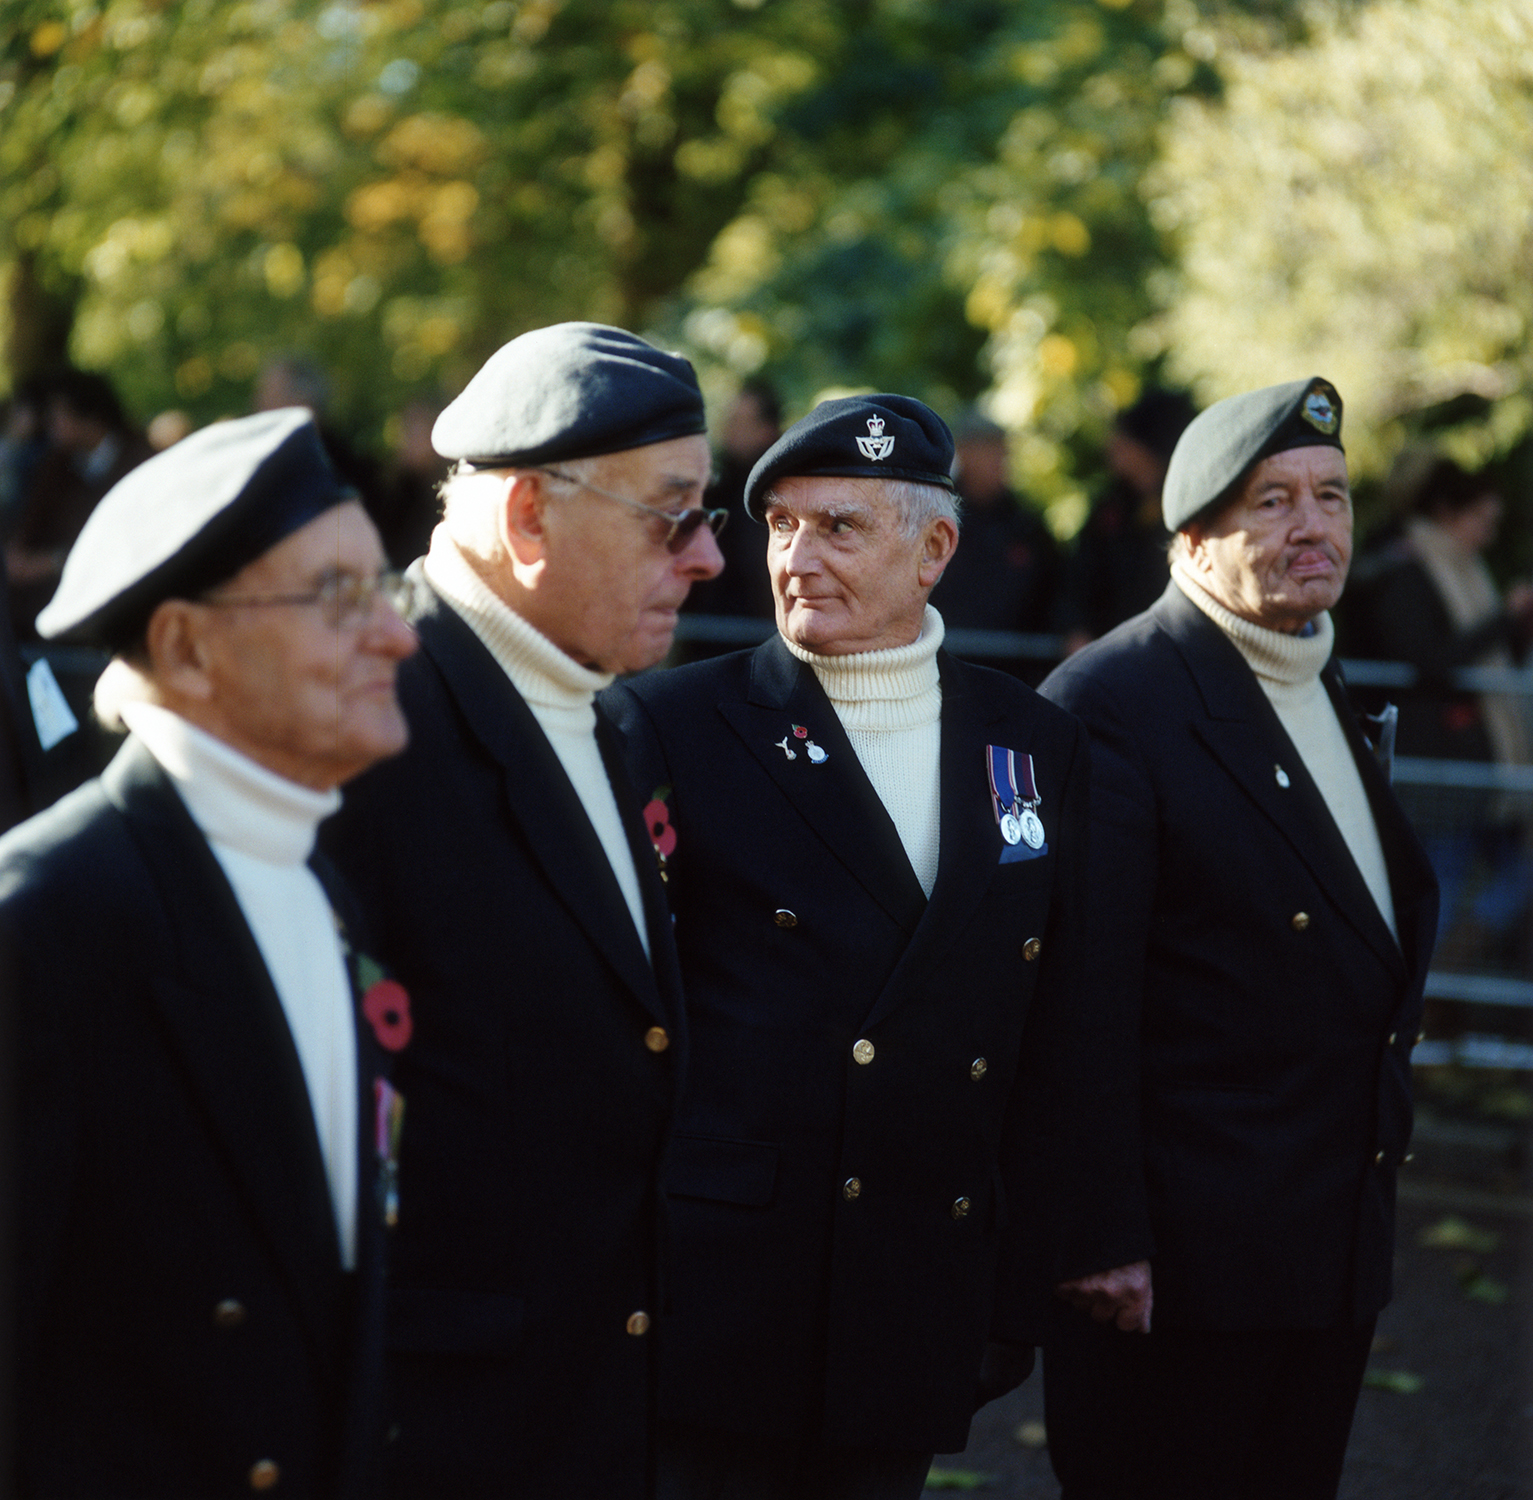 WW2 - The Cenotaph